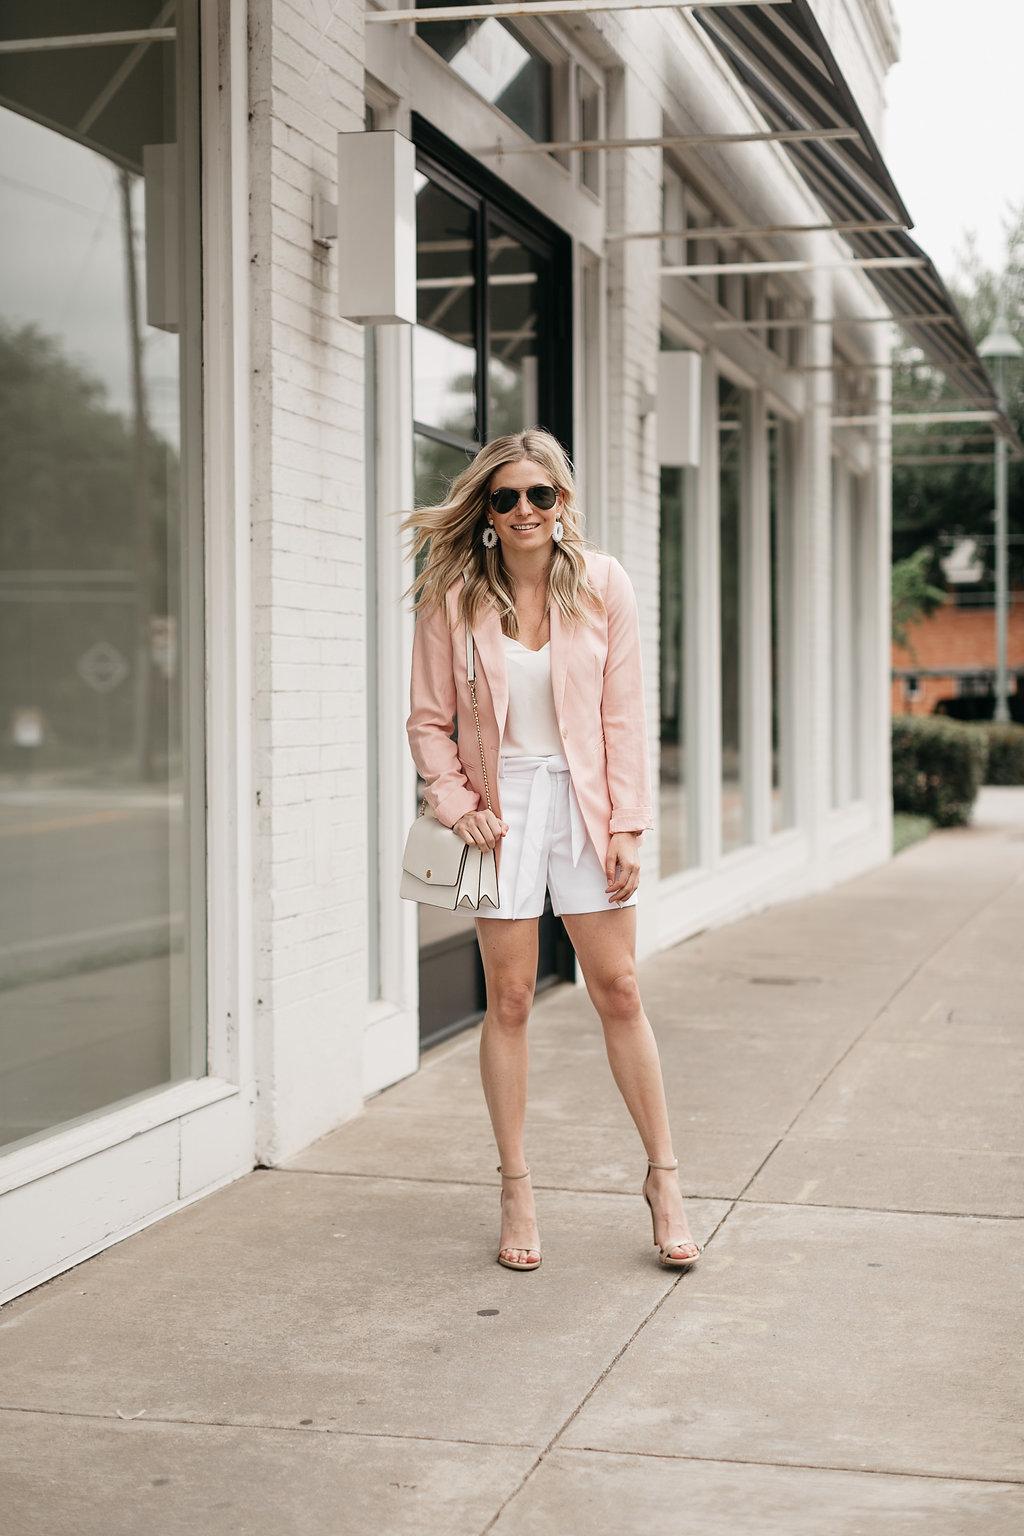 SOFTENED BLAZERN - Amanda Uprichard - Robinson Convertible Leather Shoulder Bag - MALINDA DROP EARRINGS - One Small Blonde